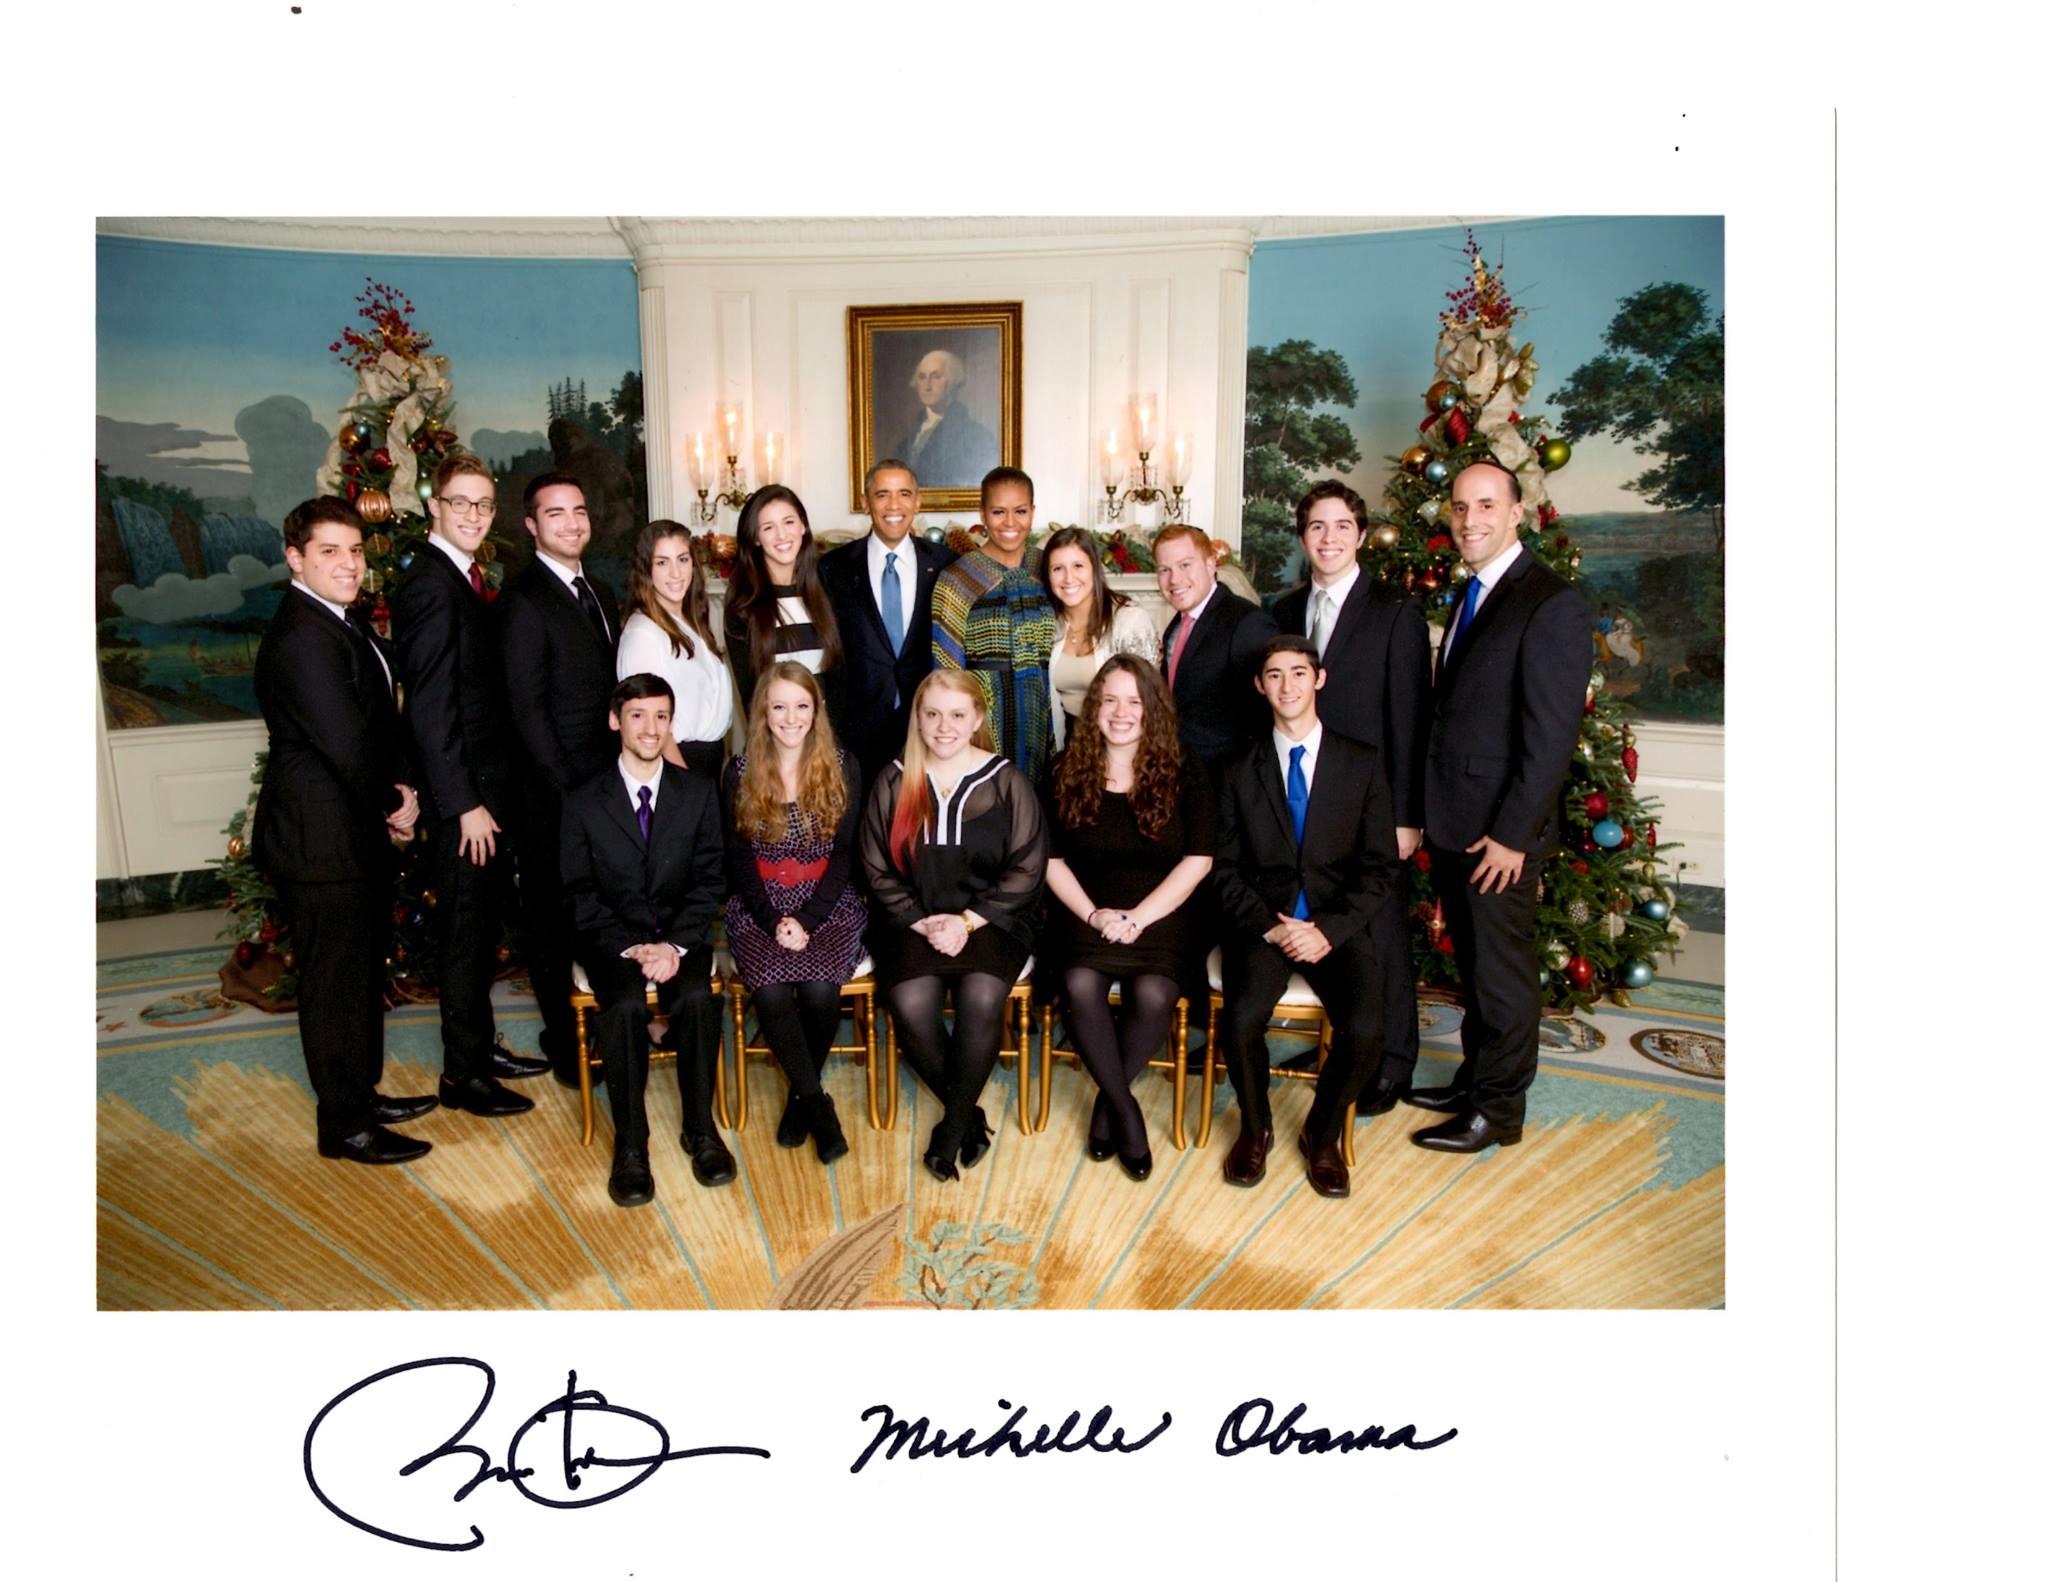 Annual White House Hanukkah Party 2014